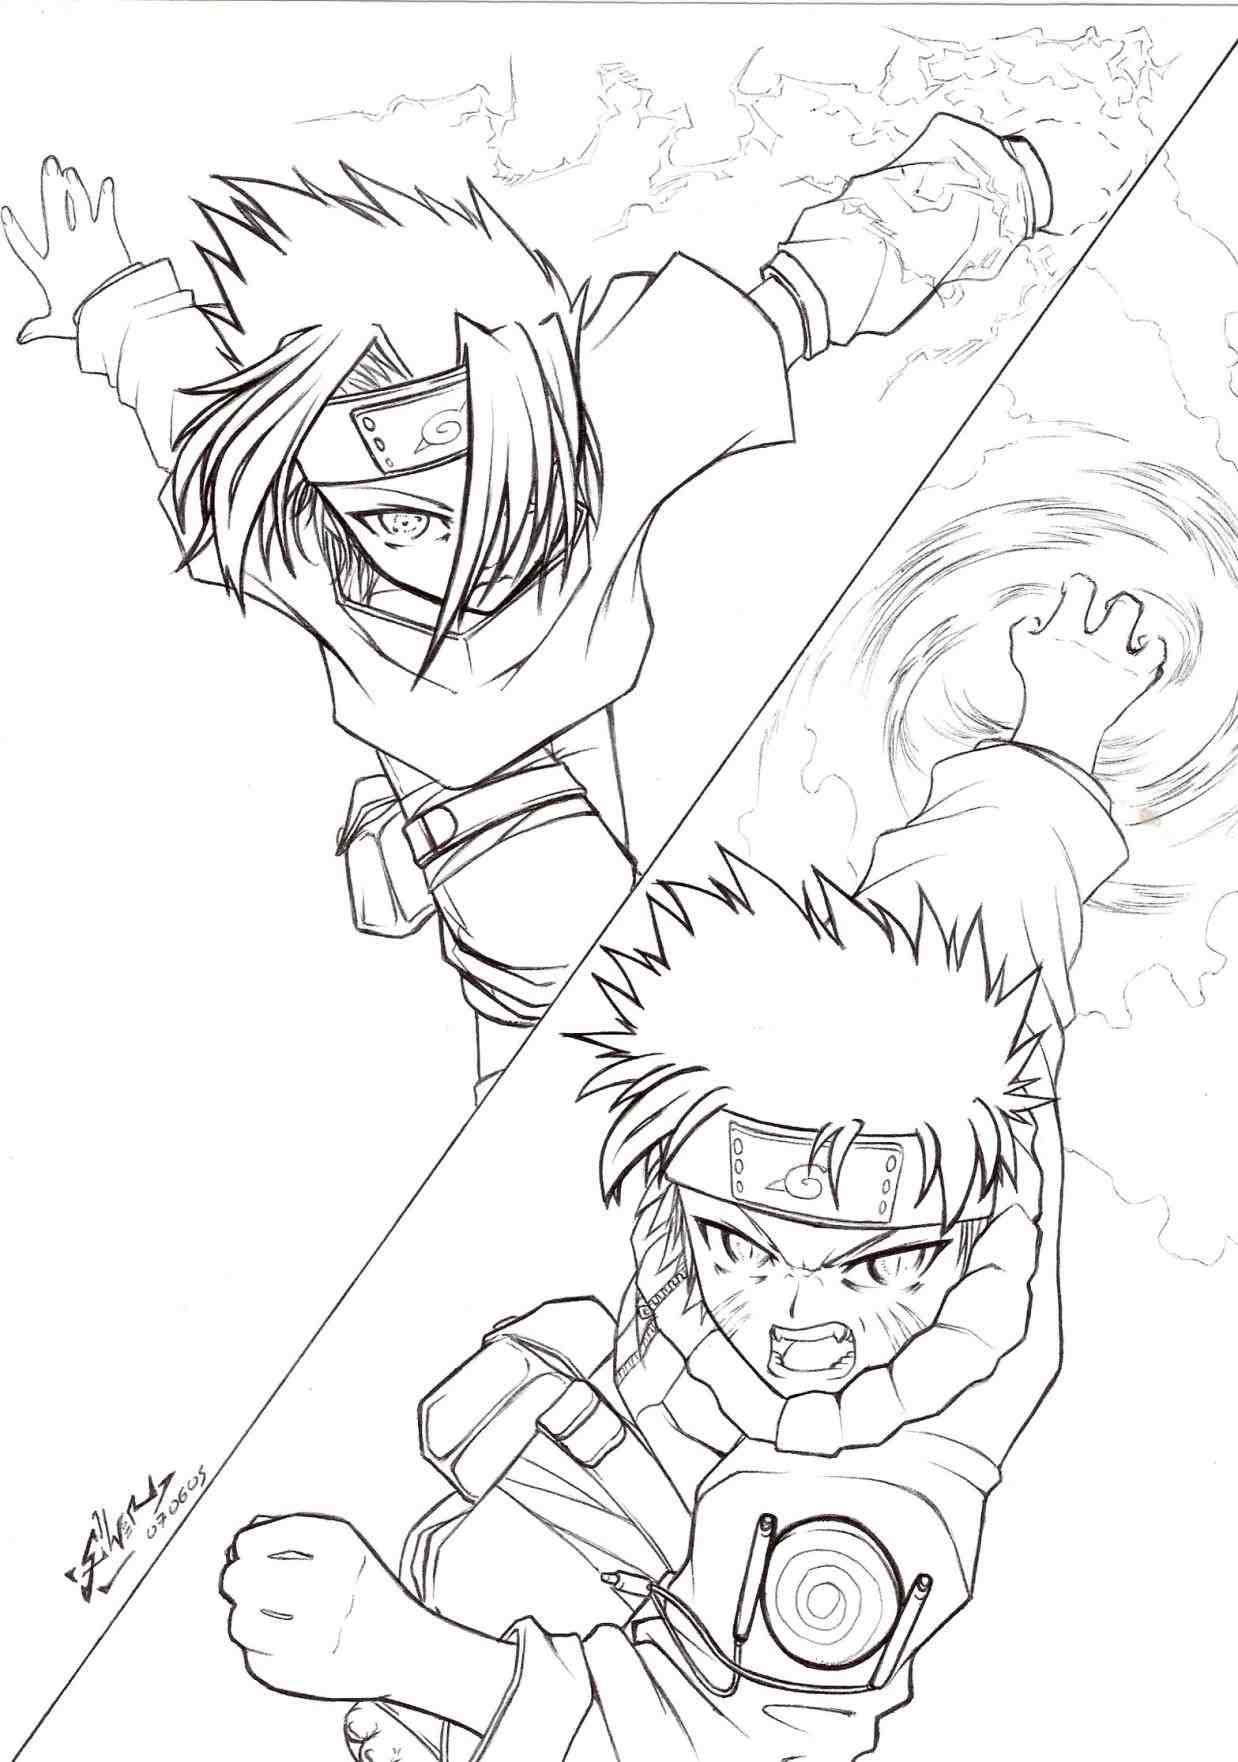 1238x1762 Naruto Vs Sasuke Rasengan Vs Chidori Drawing Drinkeats.club